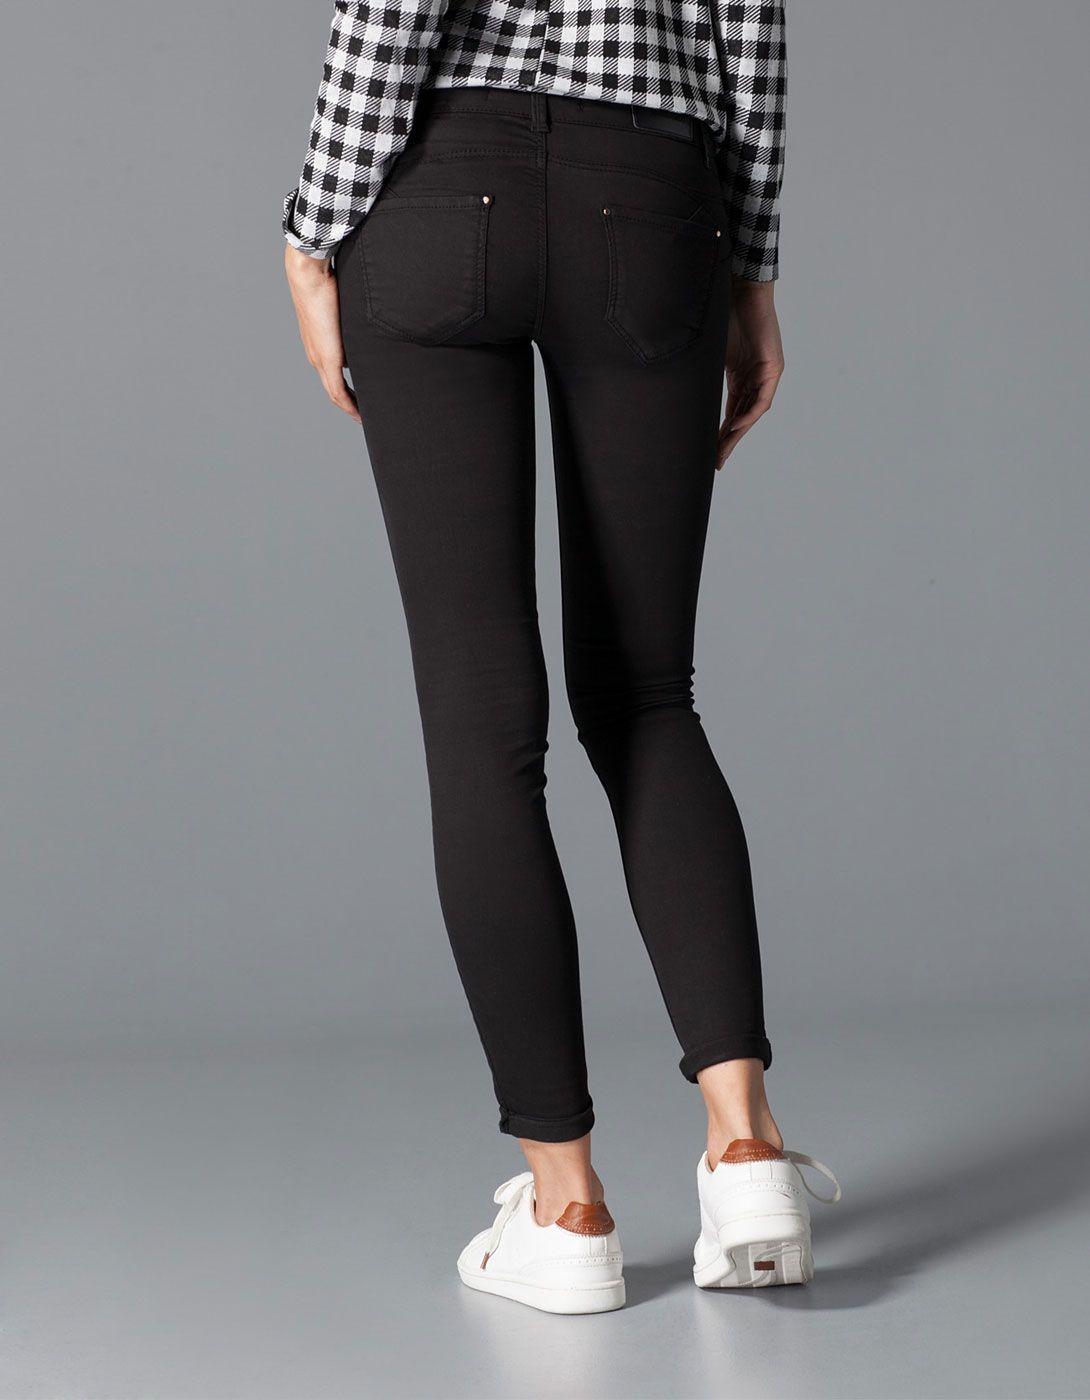 pantal n el stico push up stradivarius pantalones pinterest fall fashion moda and clothes. Black Bedroom Furniture Sets. Home Design Ideas